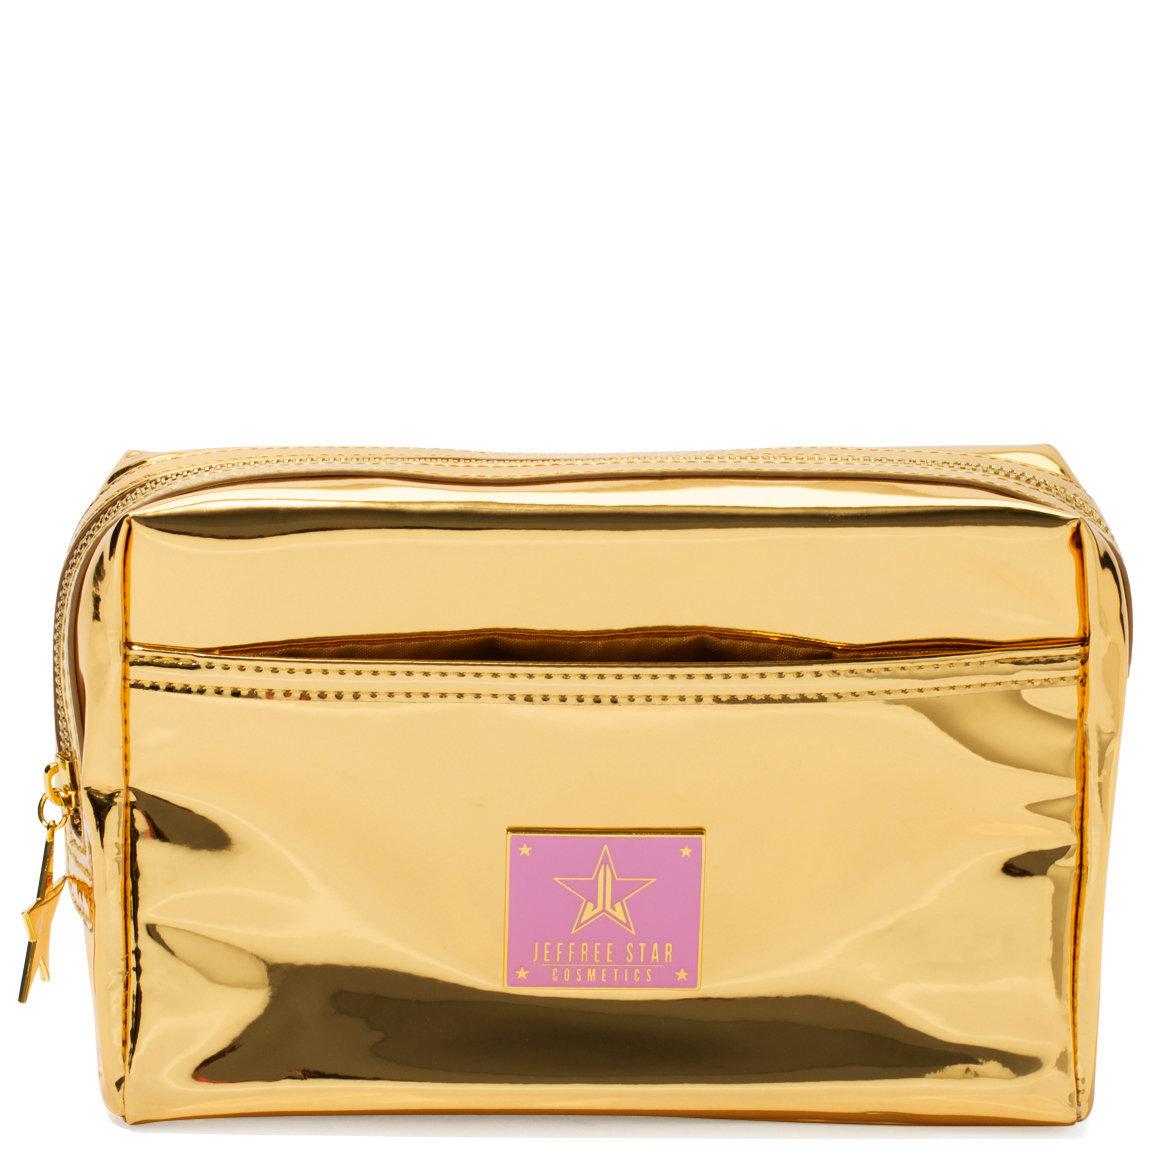 Jeffree Star Cosmetics Makeup Bag Reflective Gold product swatch.